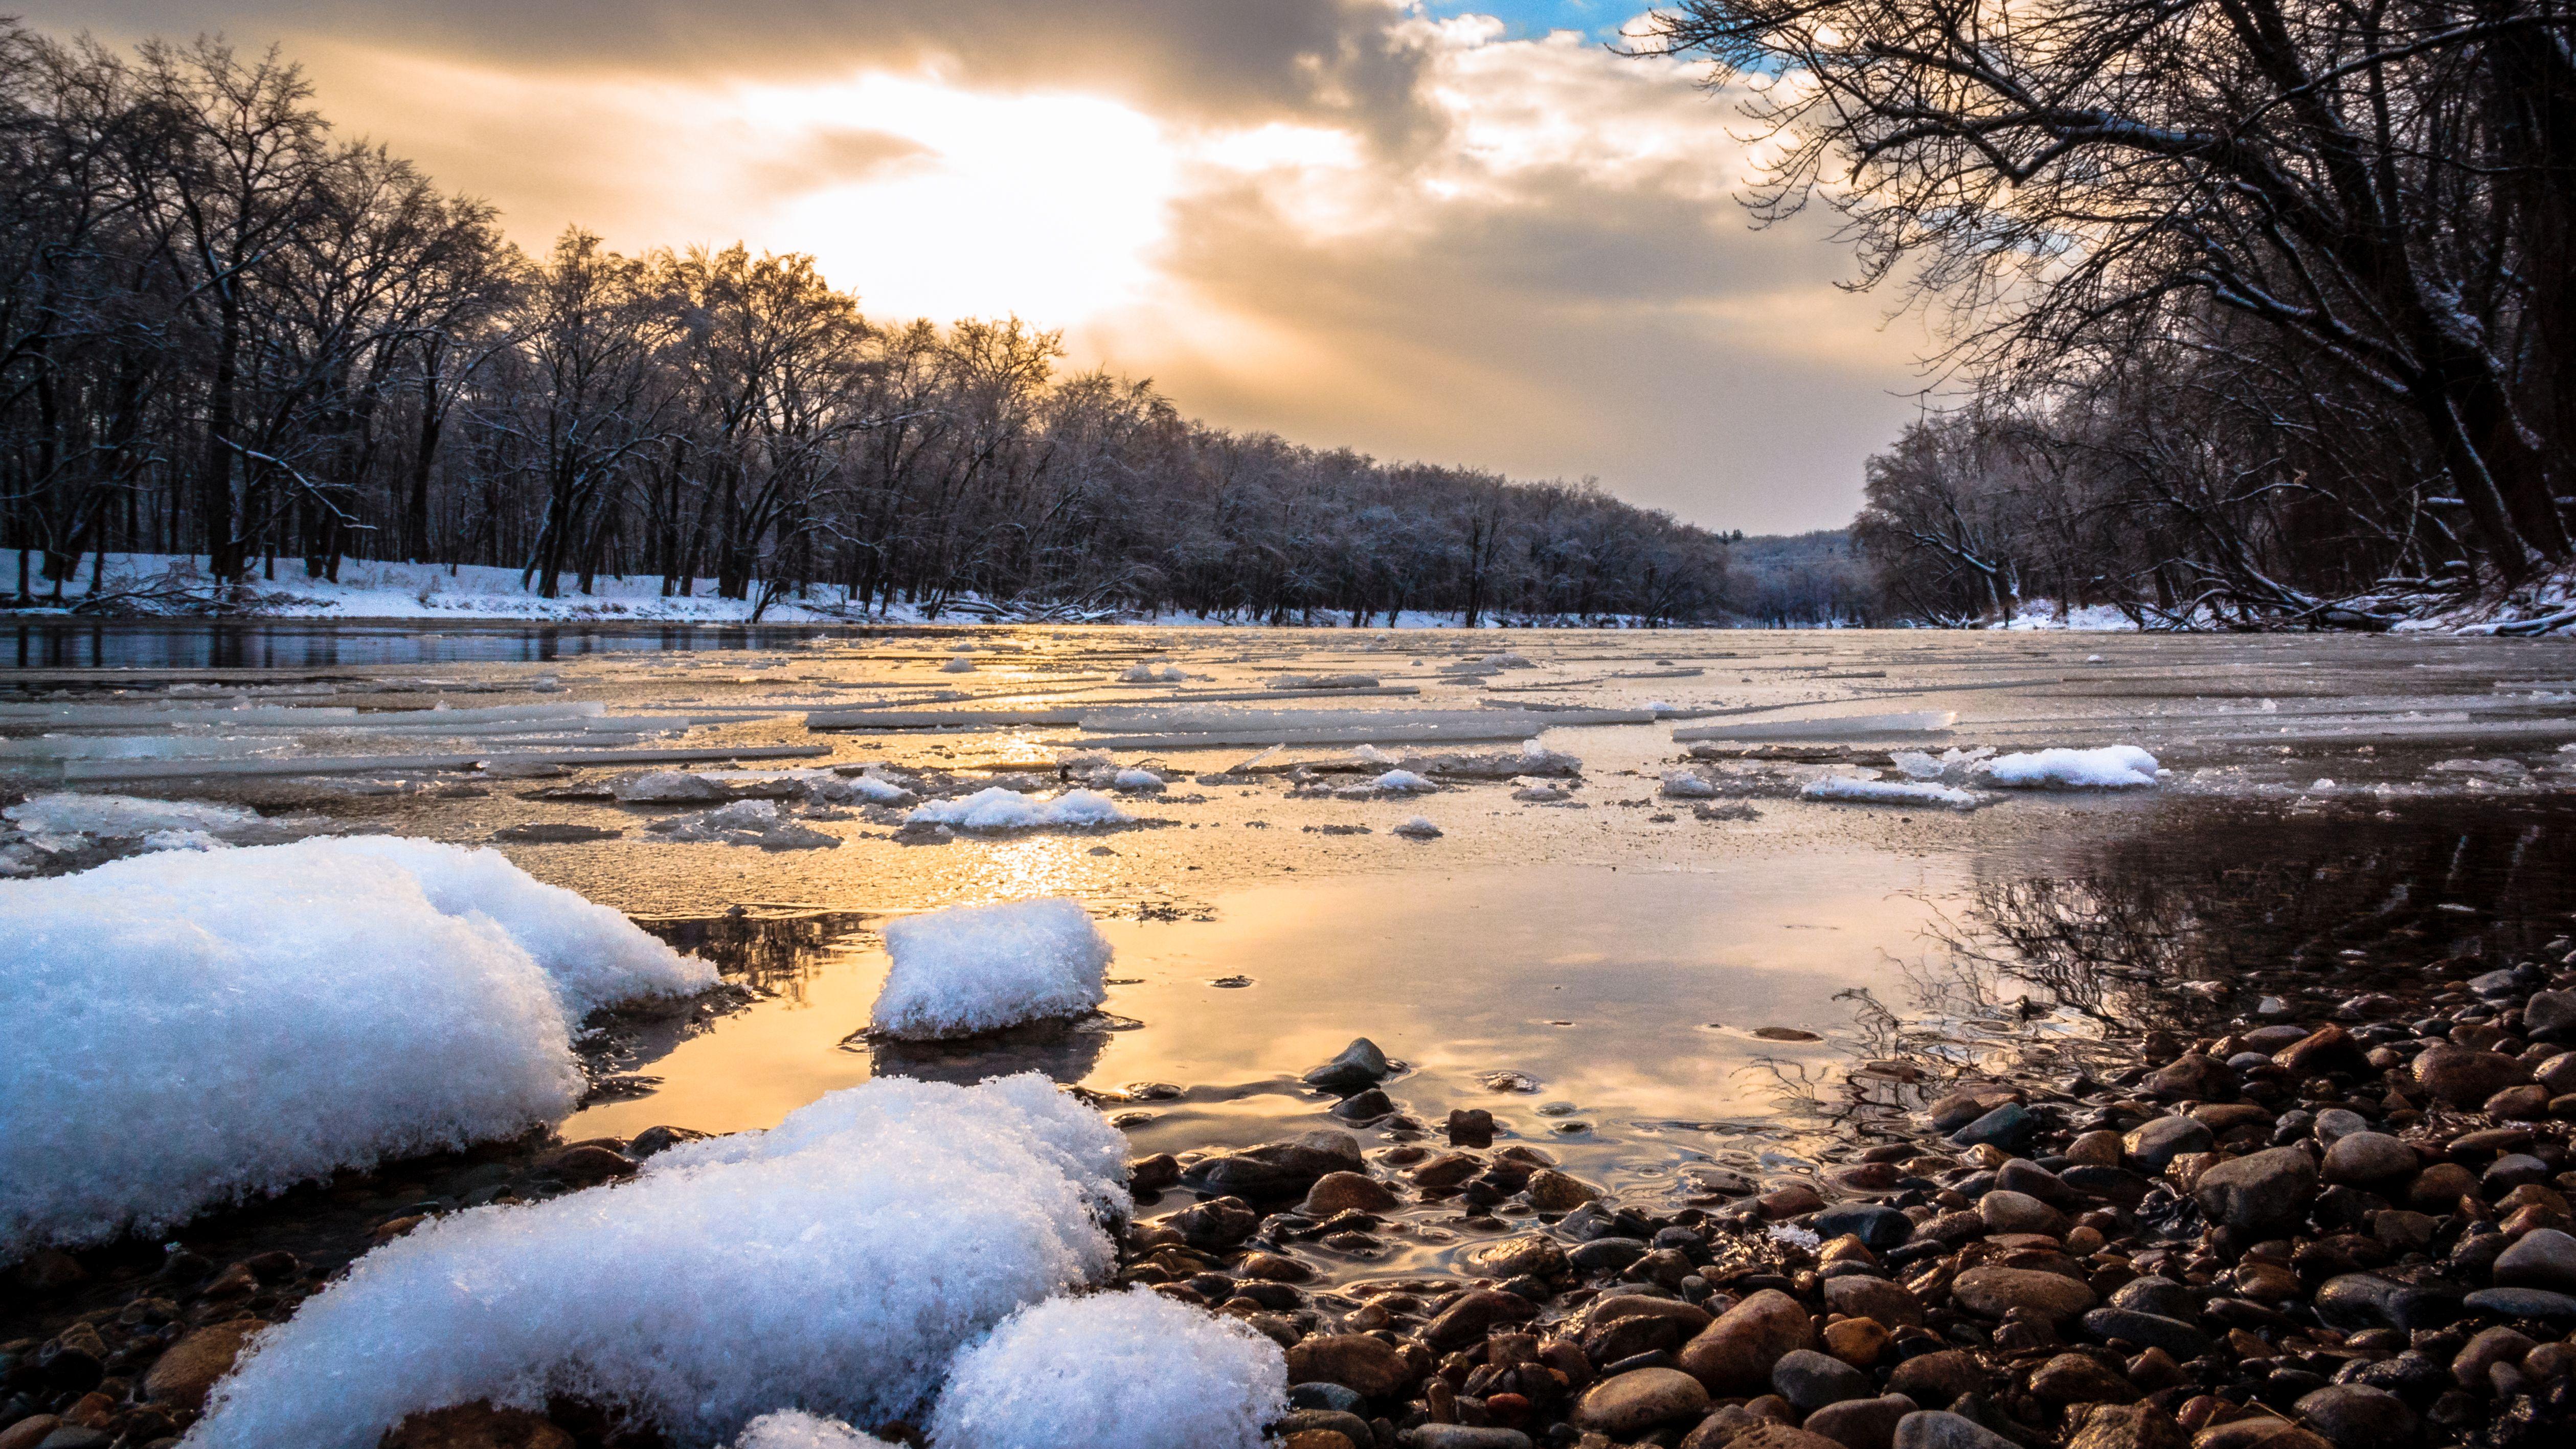 fotó: Bobby Palosaari, flick.com